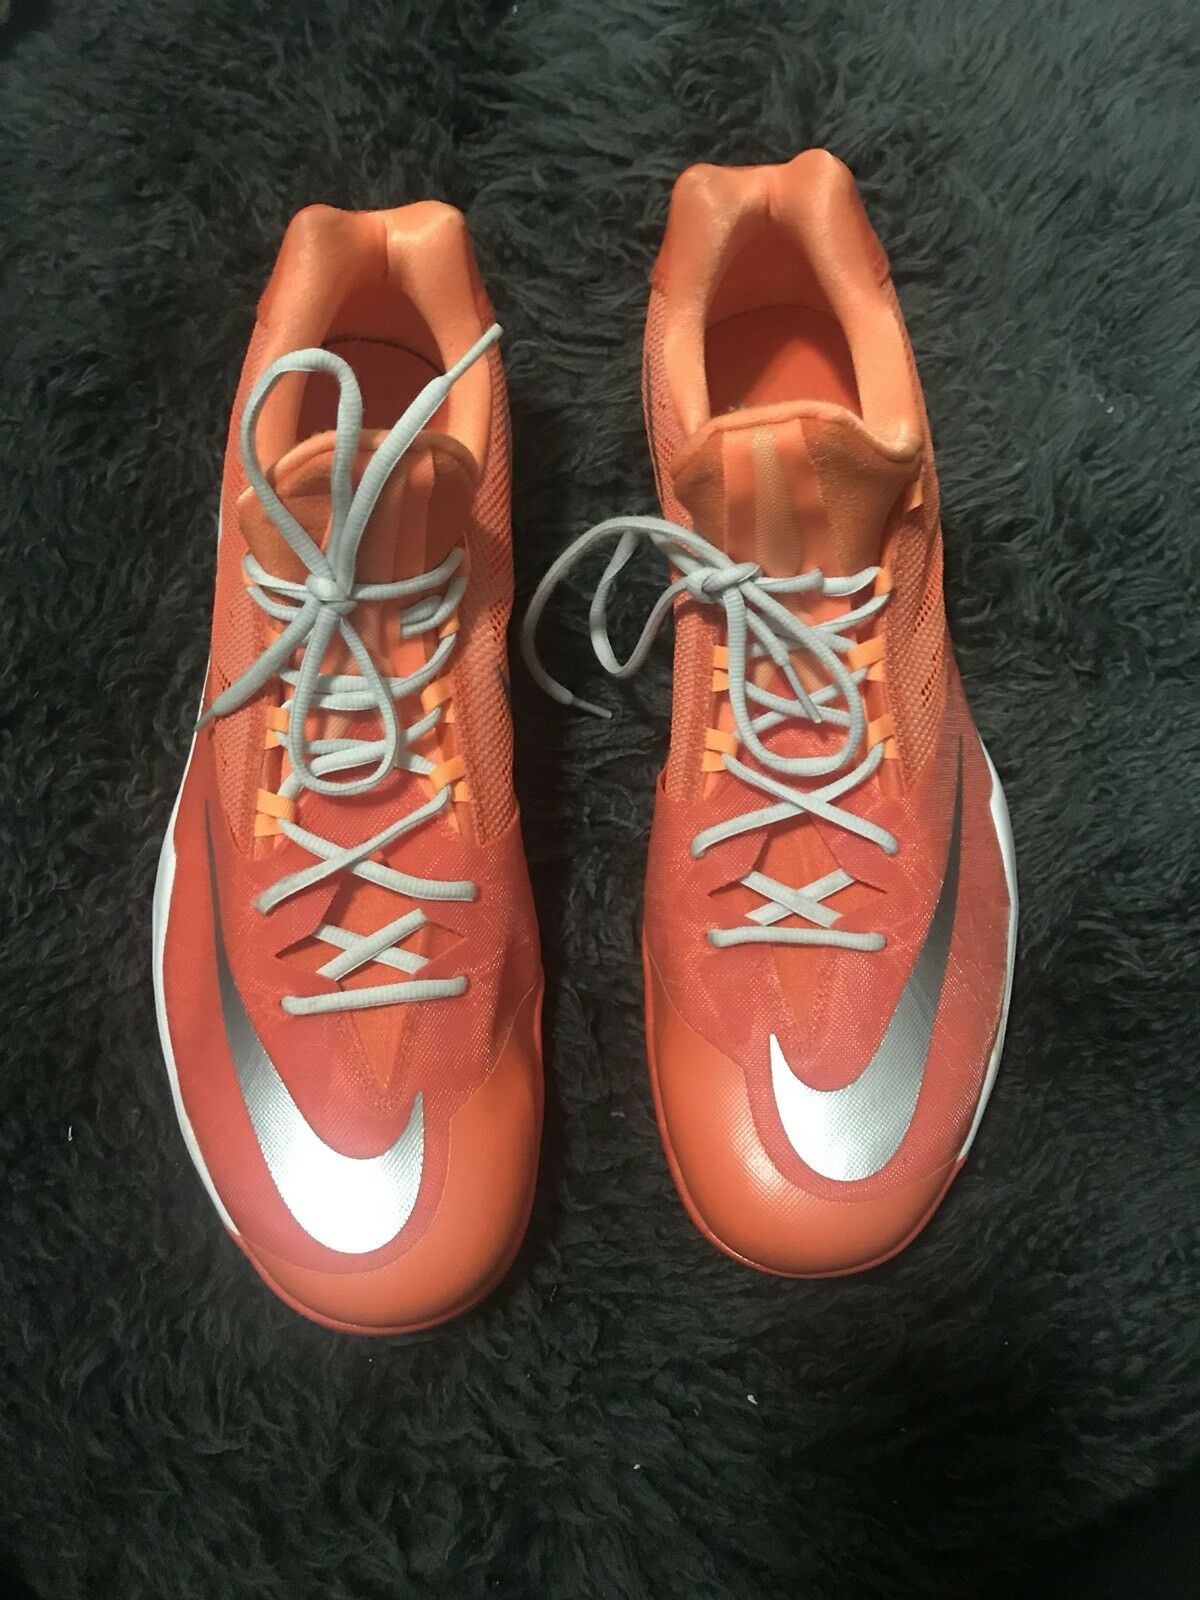 0dbf23557346 NIKE NIKE NIKE Mens Zoom Orange Mesh Detail Sneakers Size 18 d776ae ...